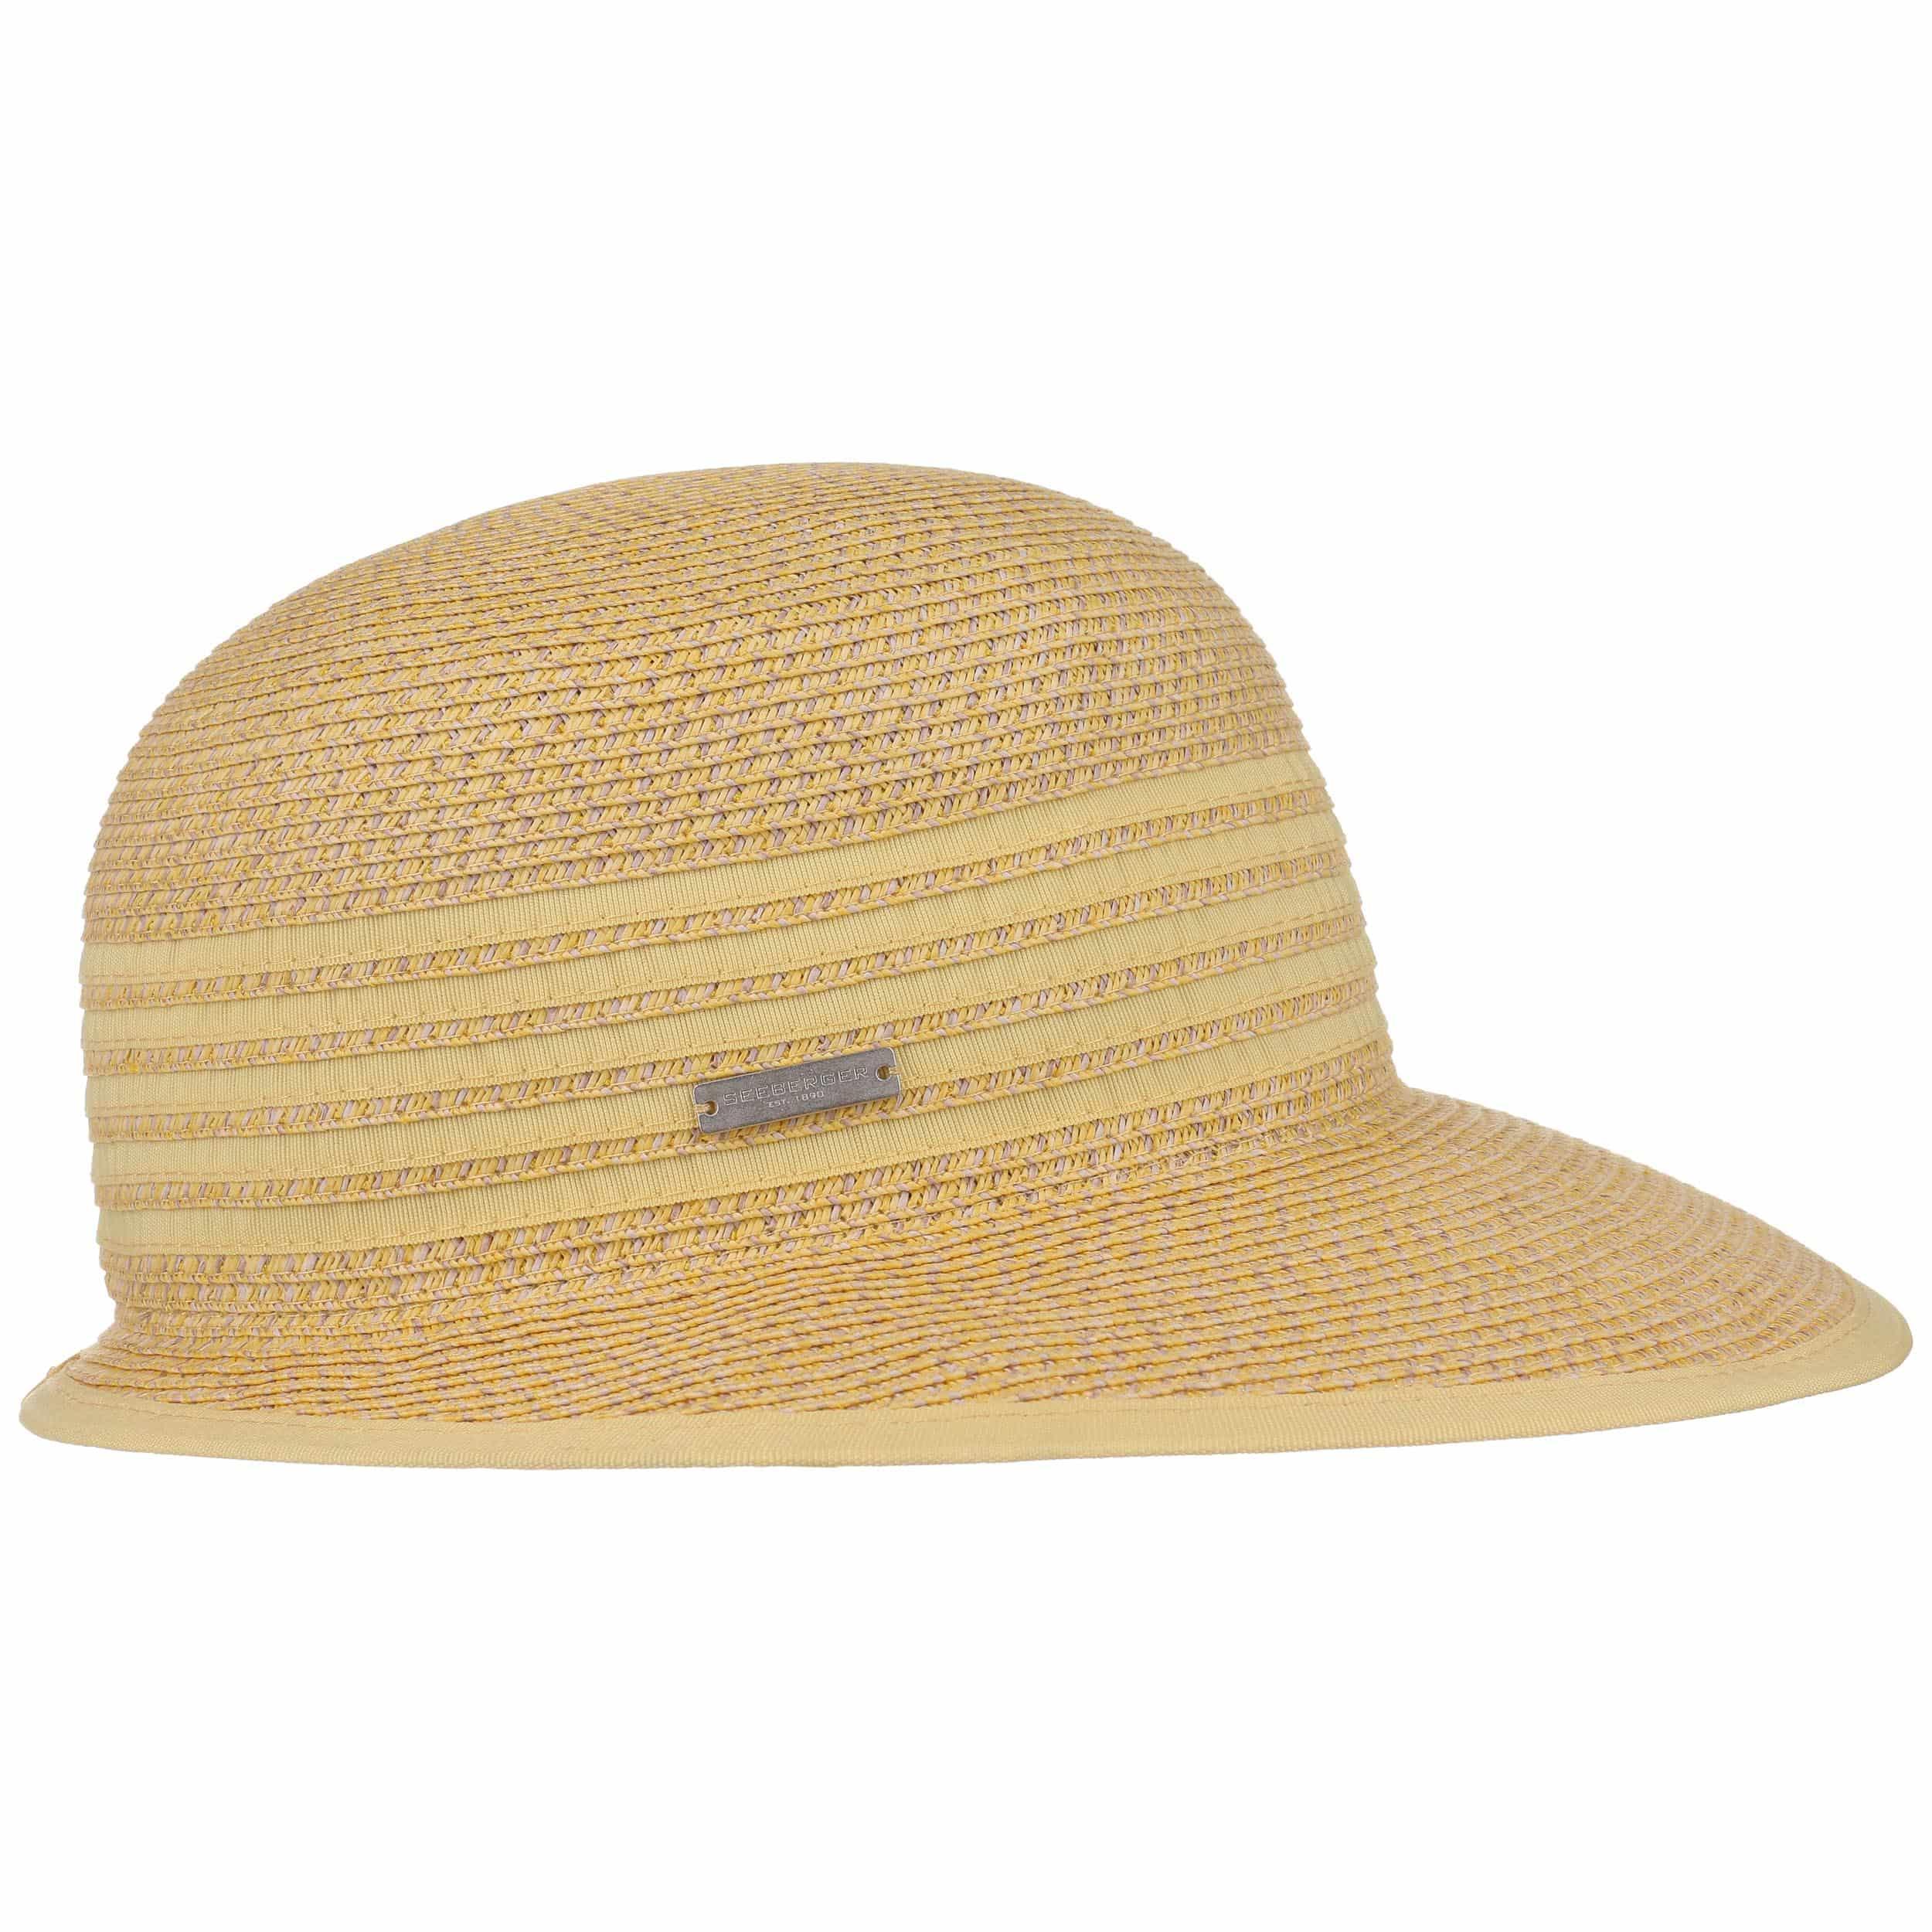 Sombrero de Paja Isa Twotone by Seeberger - Sombreros - sombreroshop.es 3e3bf650a6e